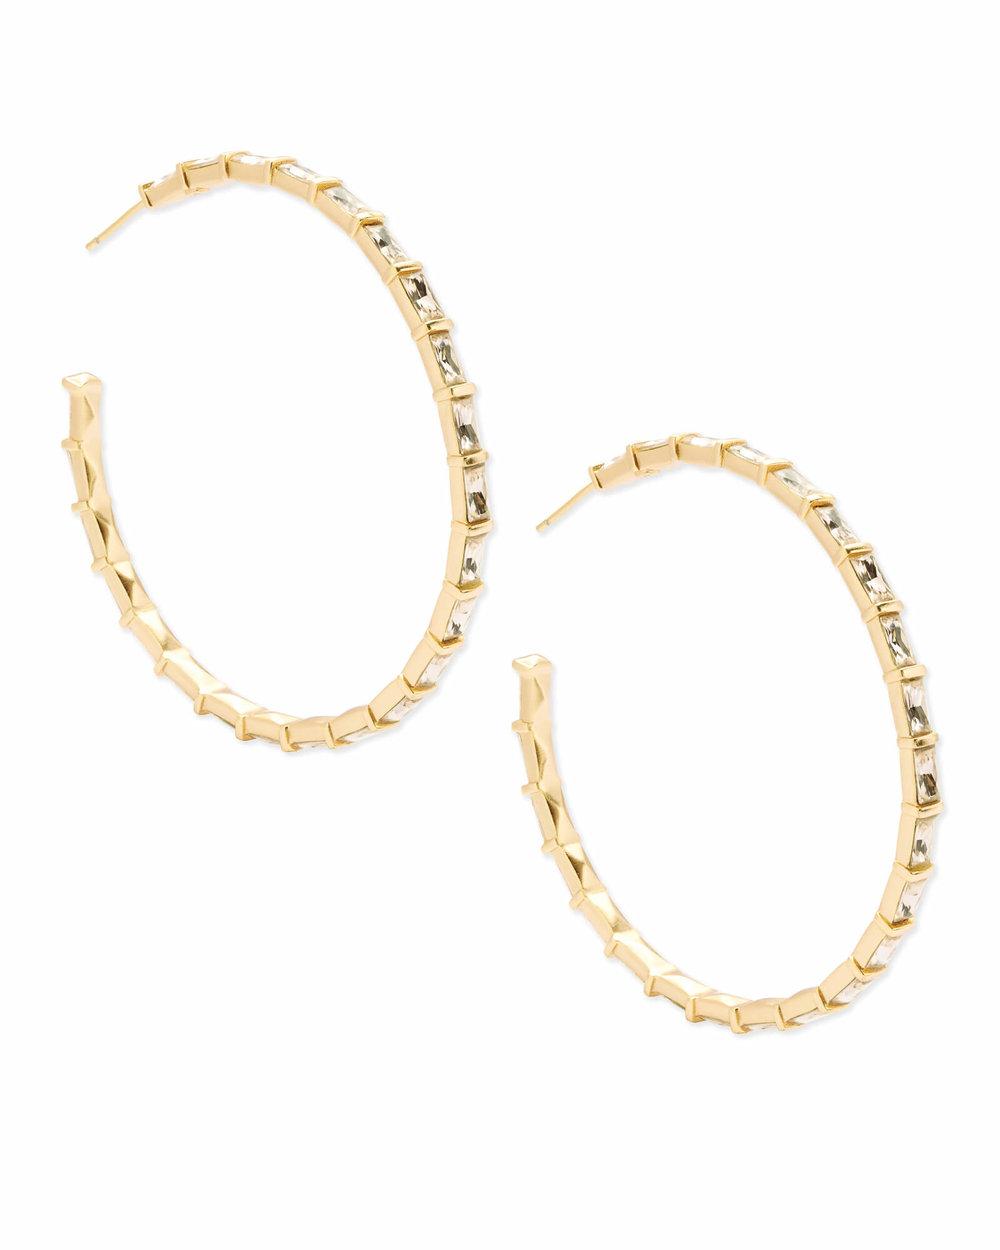 kendra-scott-thora-earrings-gold-smoky-mix-00-lg.jpg